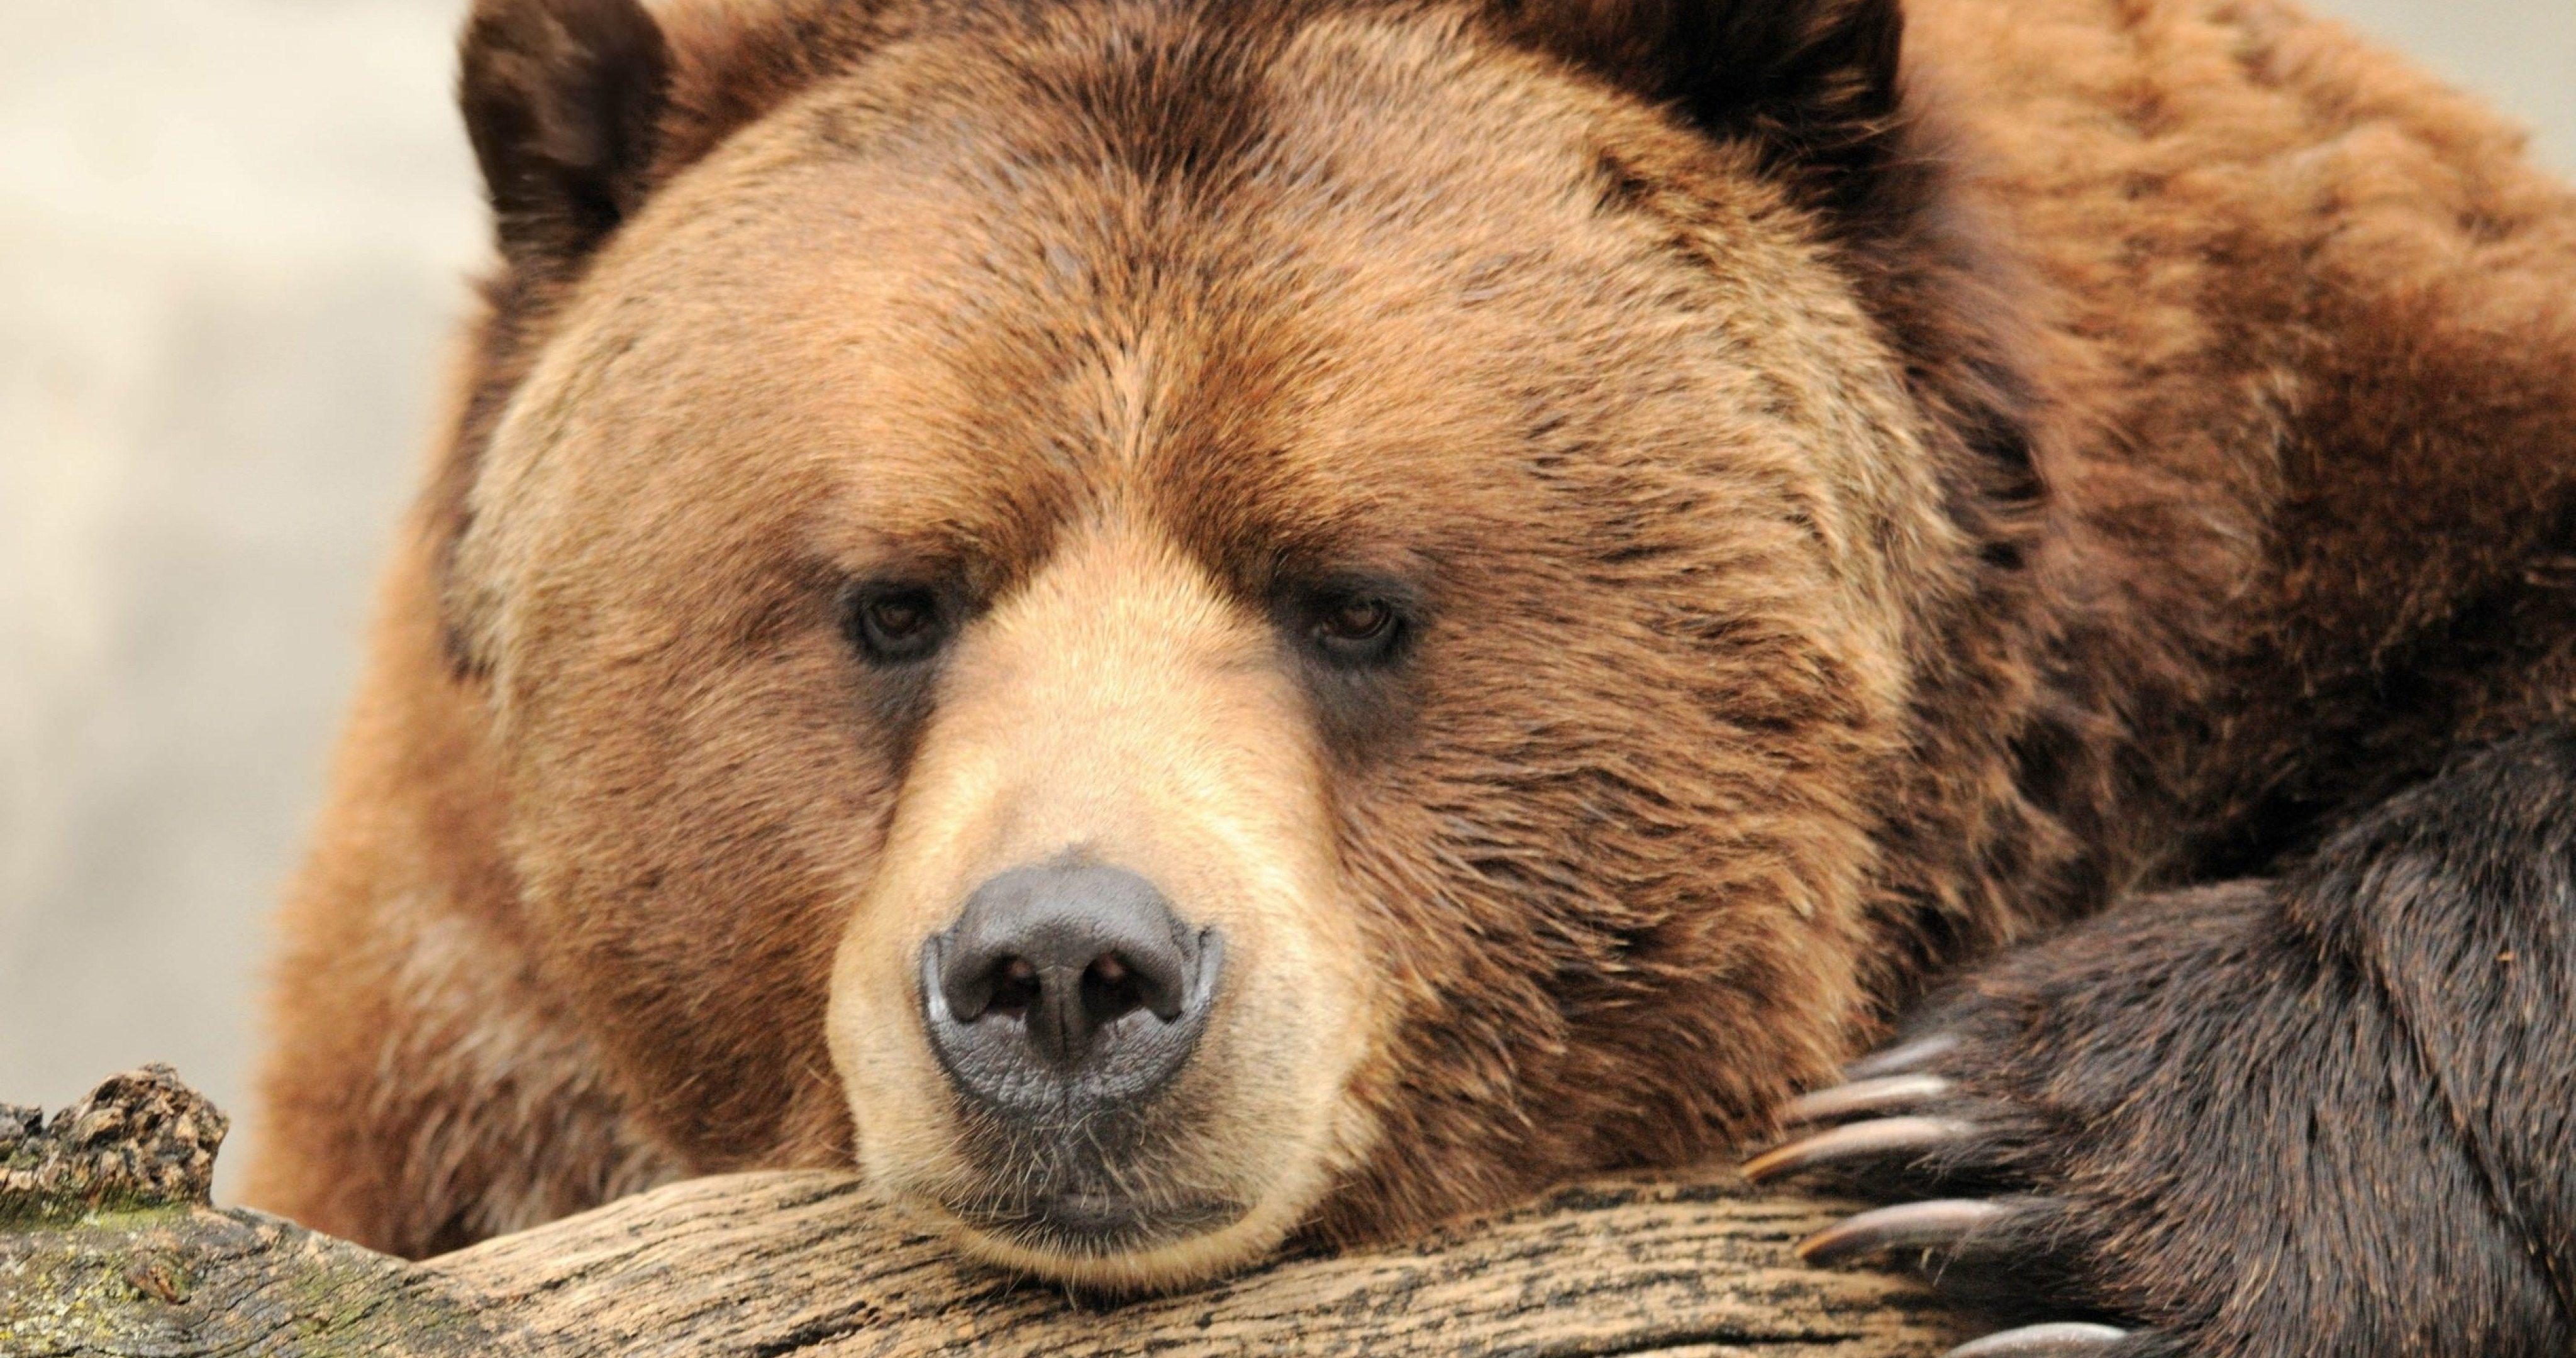 bear brown burry 4k ultra hd wallpaper Bear, Grizzly